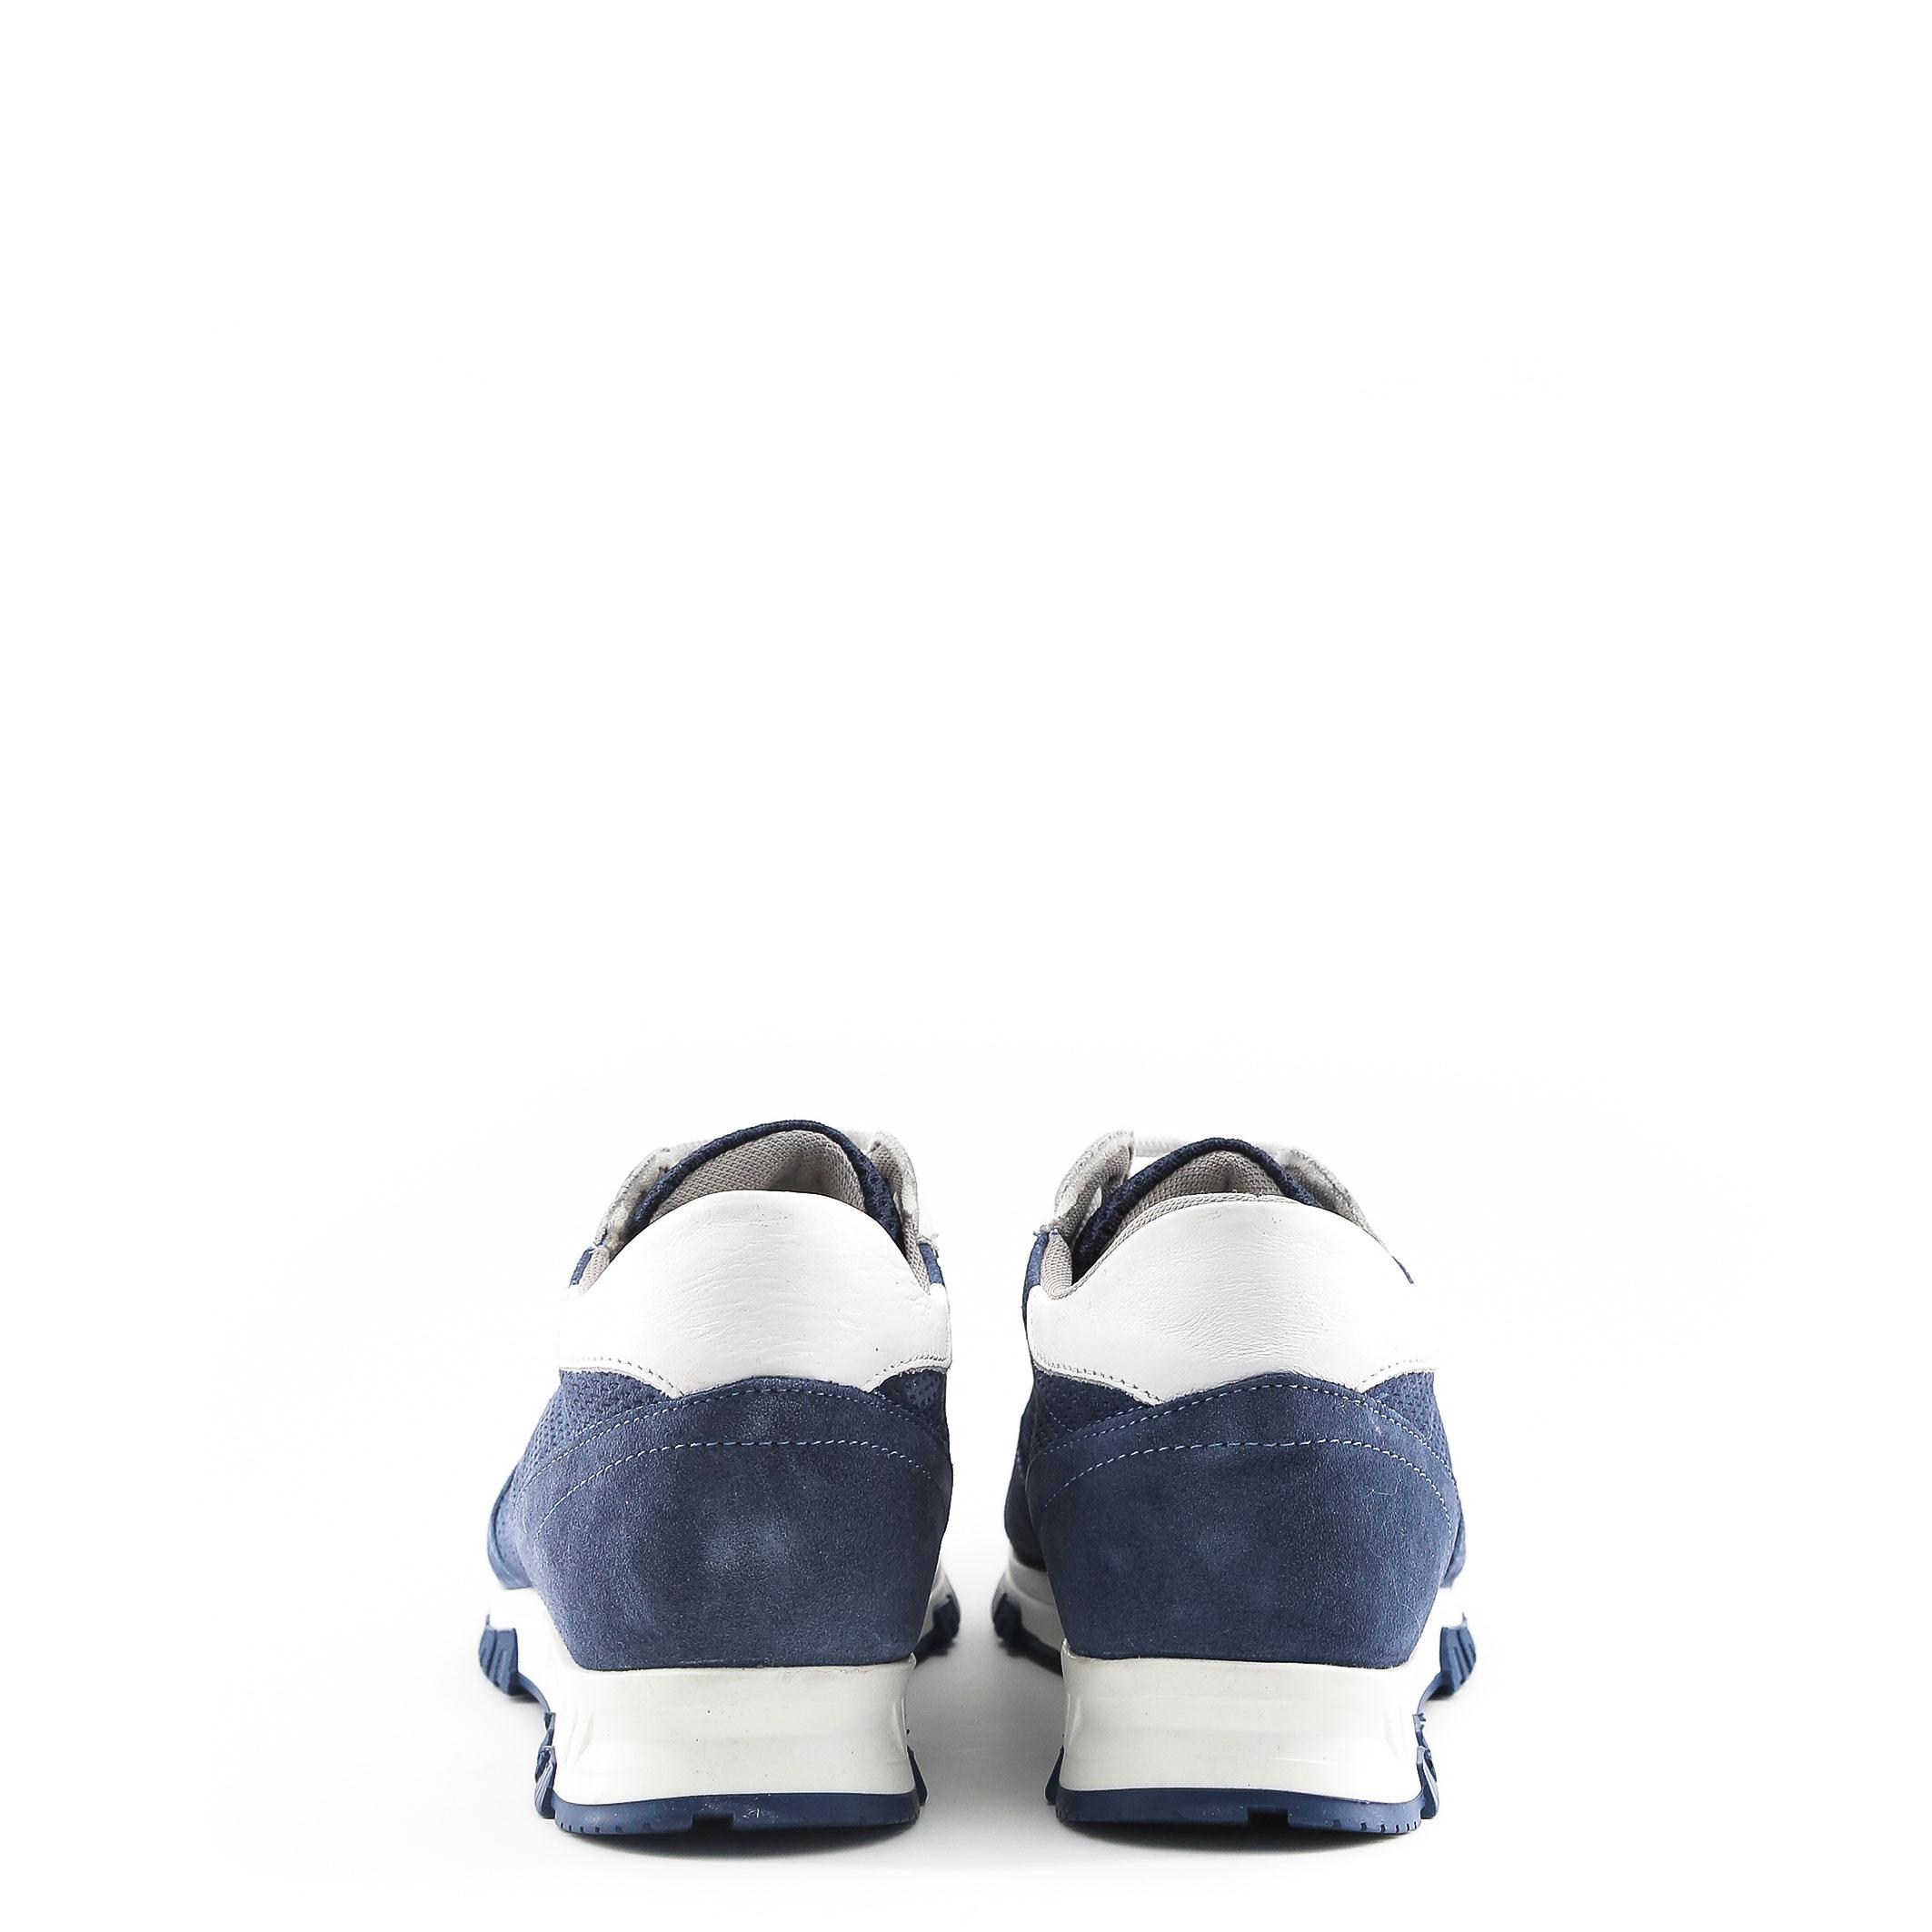 Made in Italia RAFFAELE blue